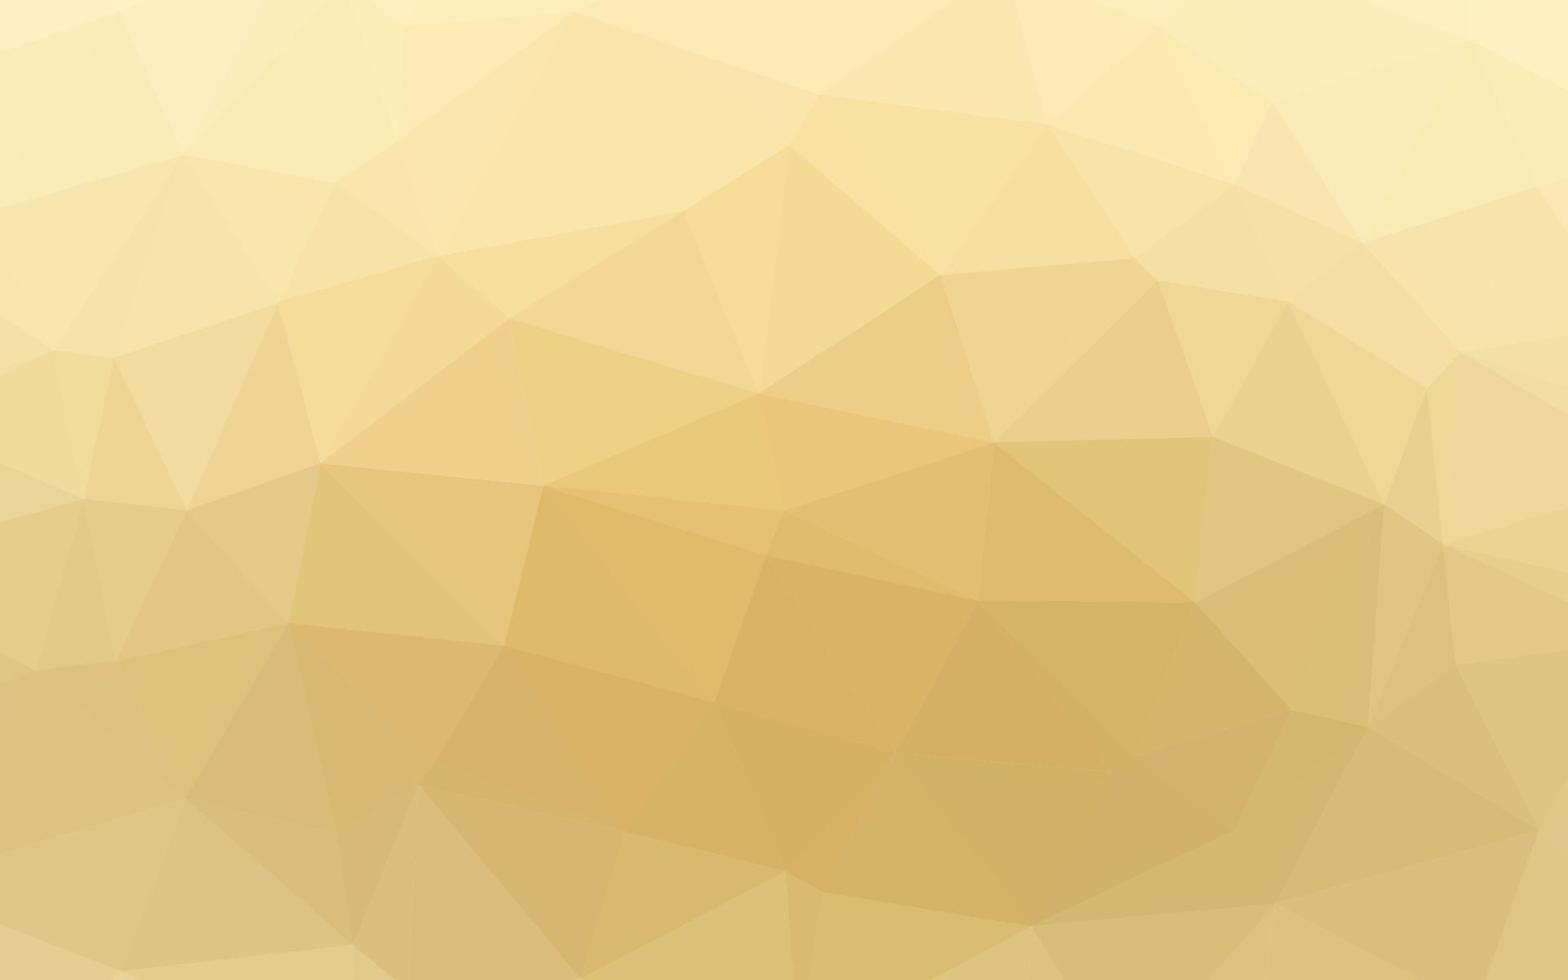 textura de baixo poli de vetor amarelo e laranja claro.